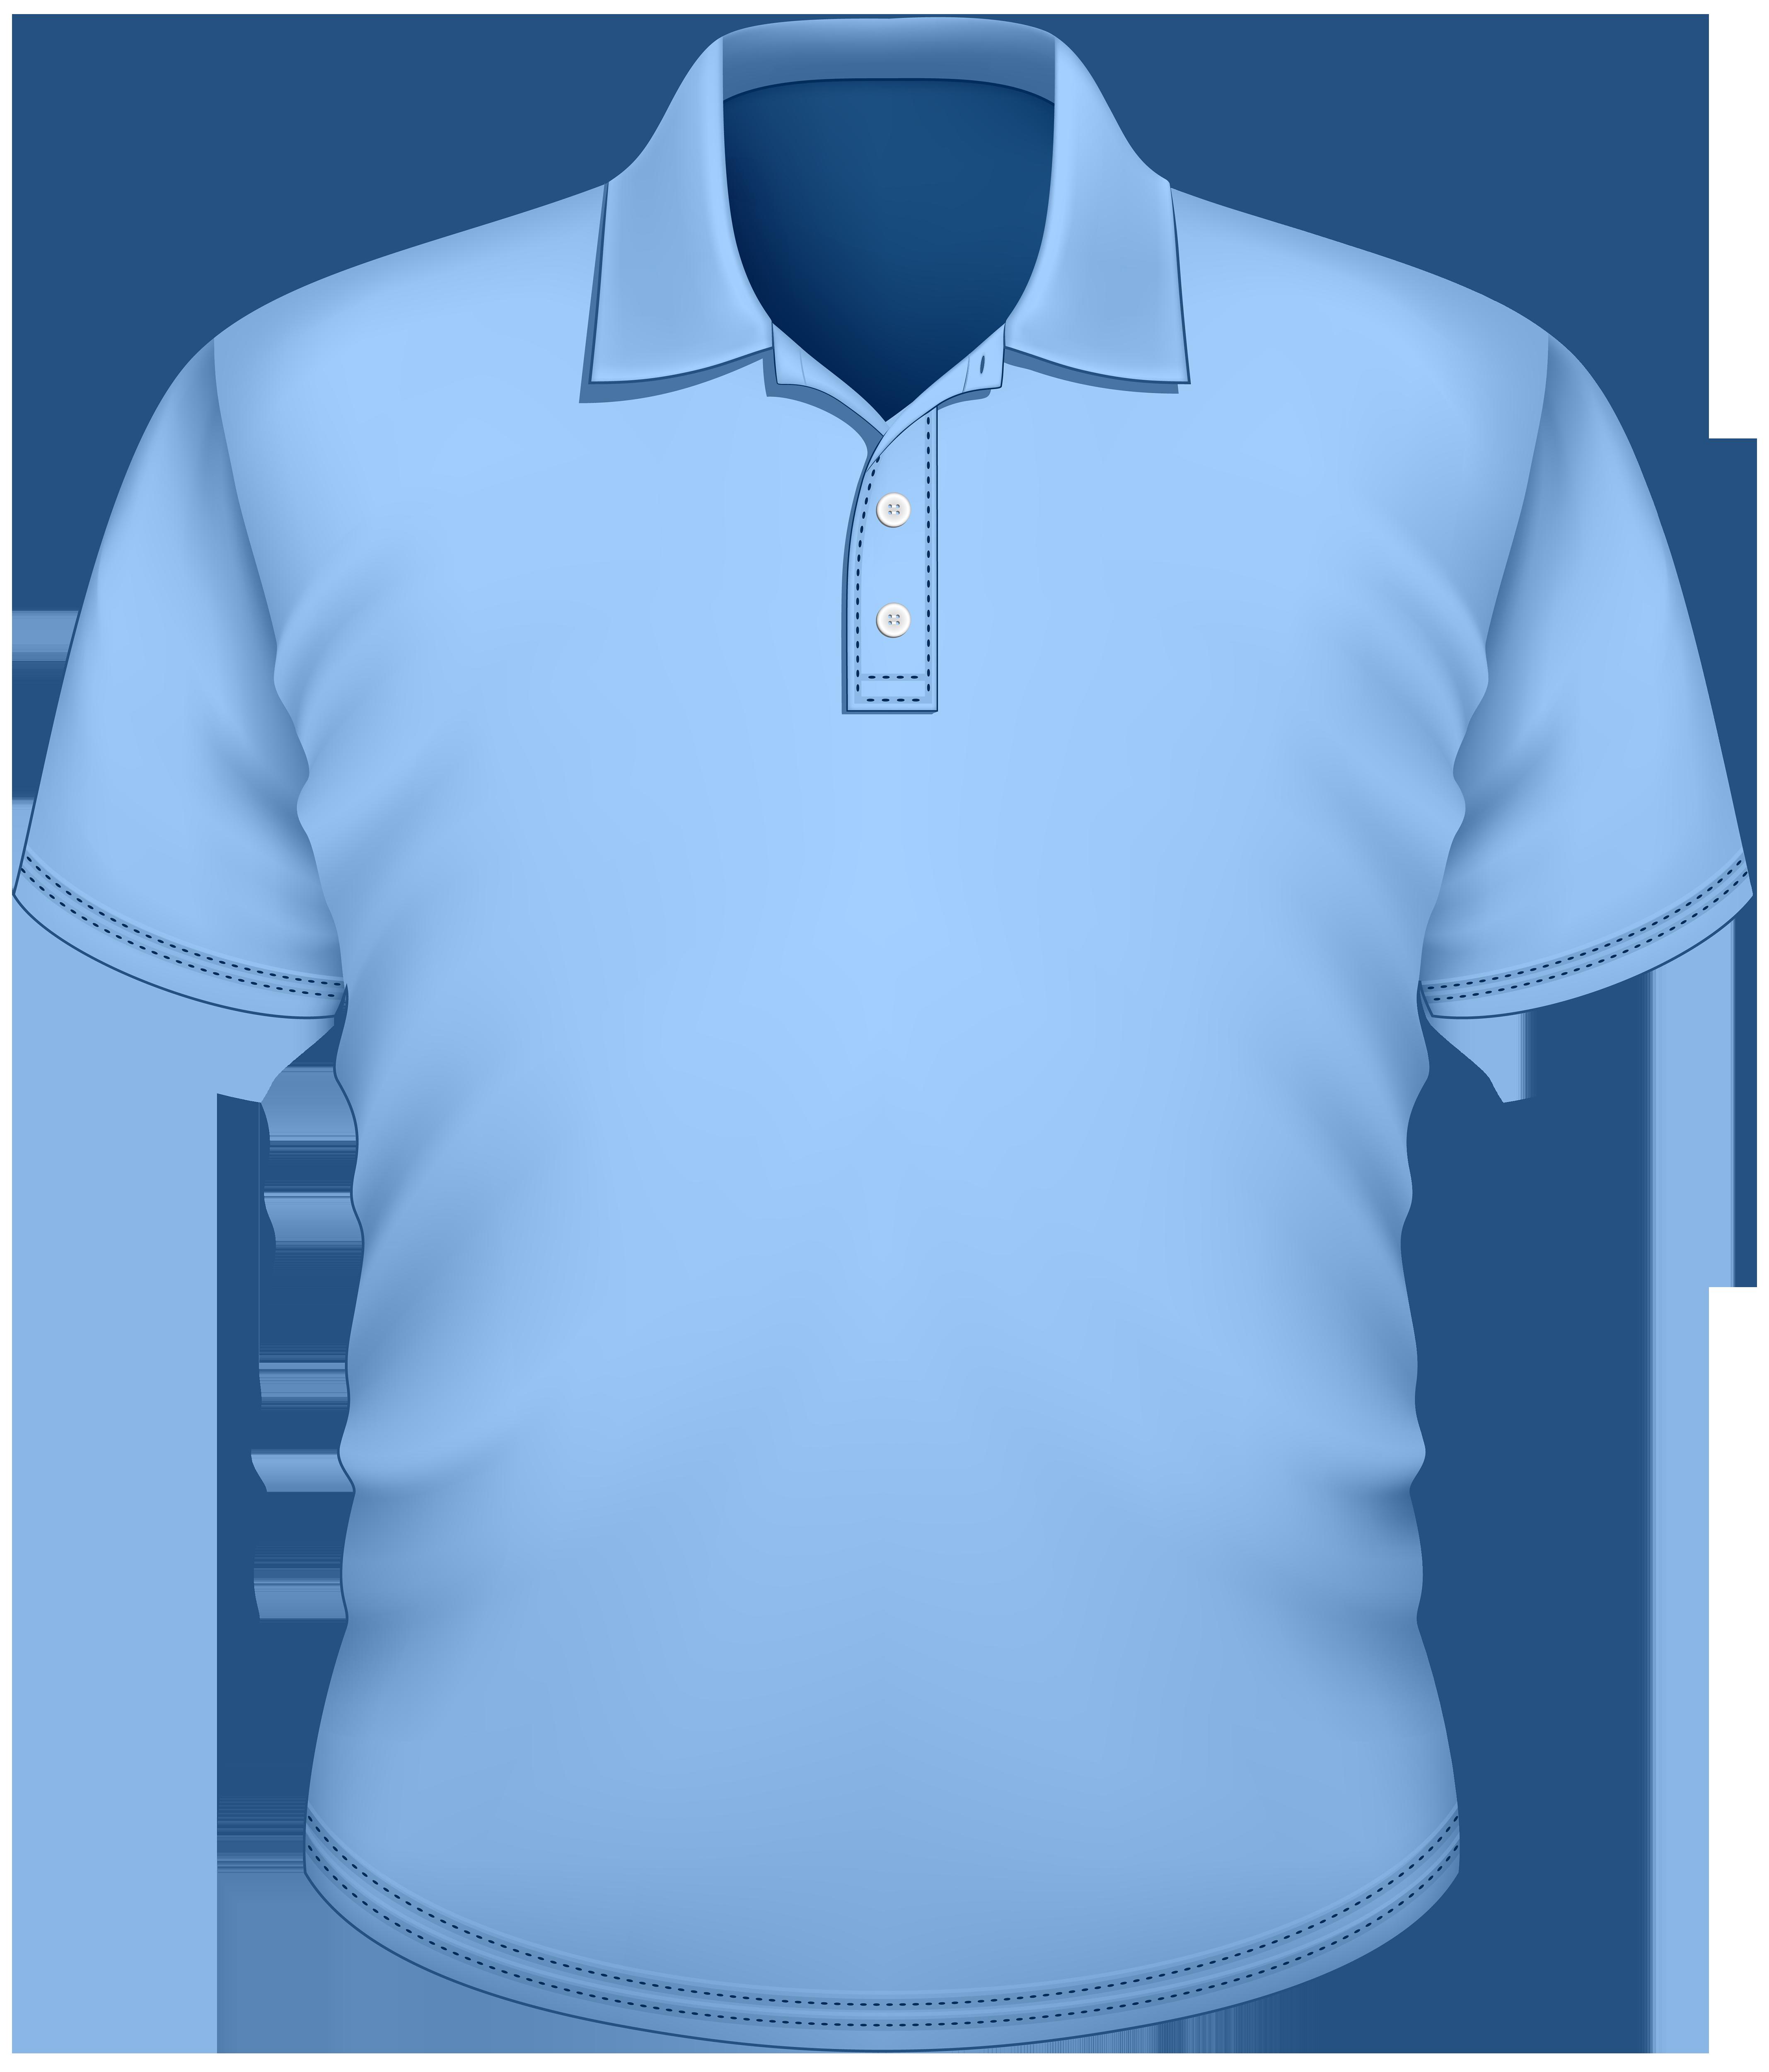 Male Blue Shirt PNG Clipart.